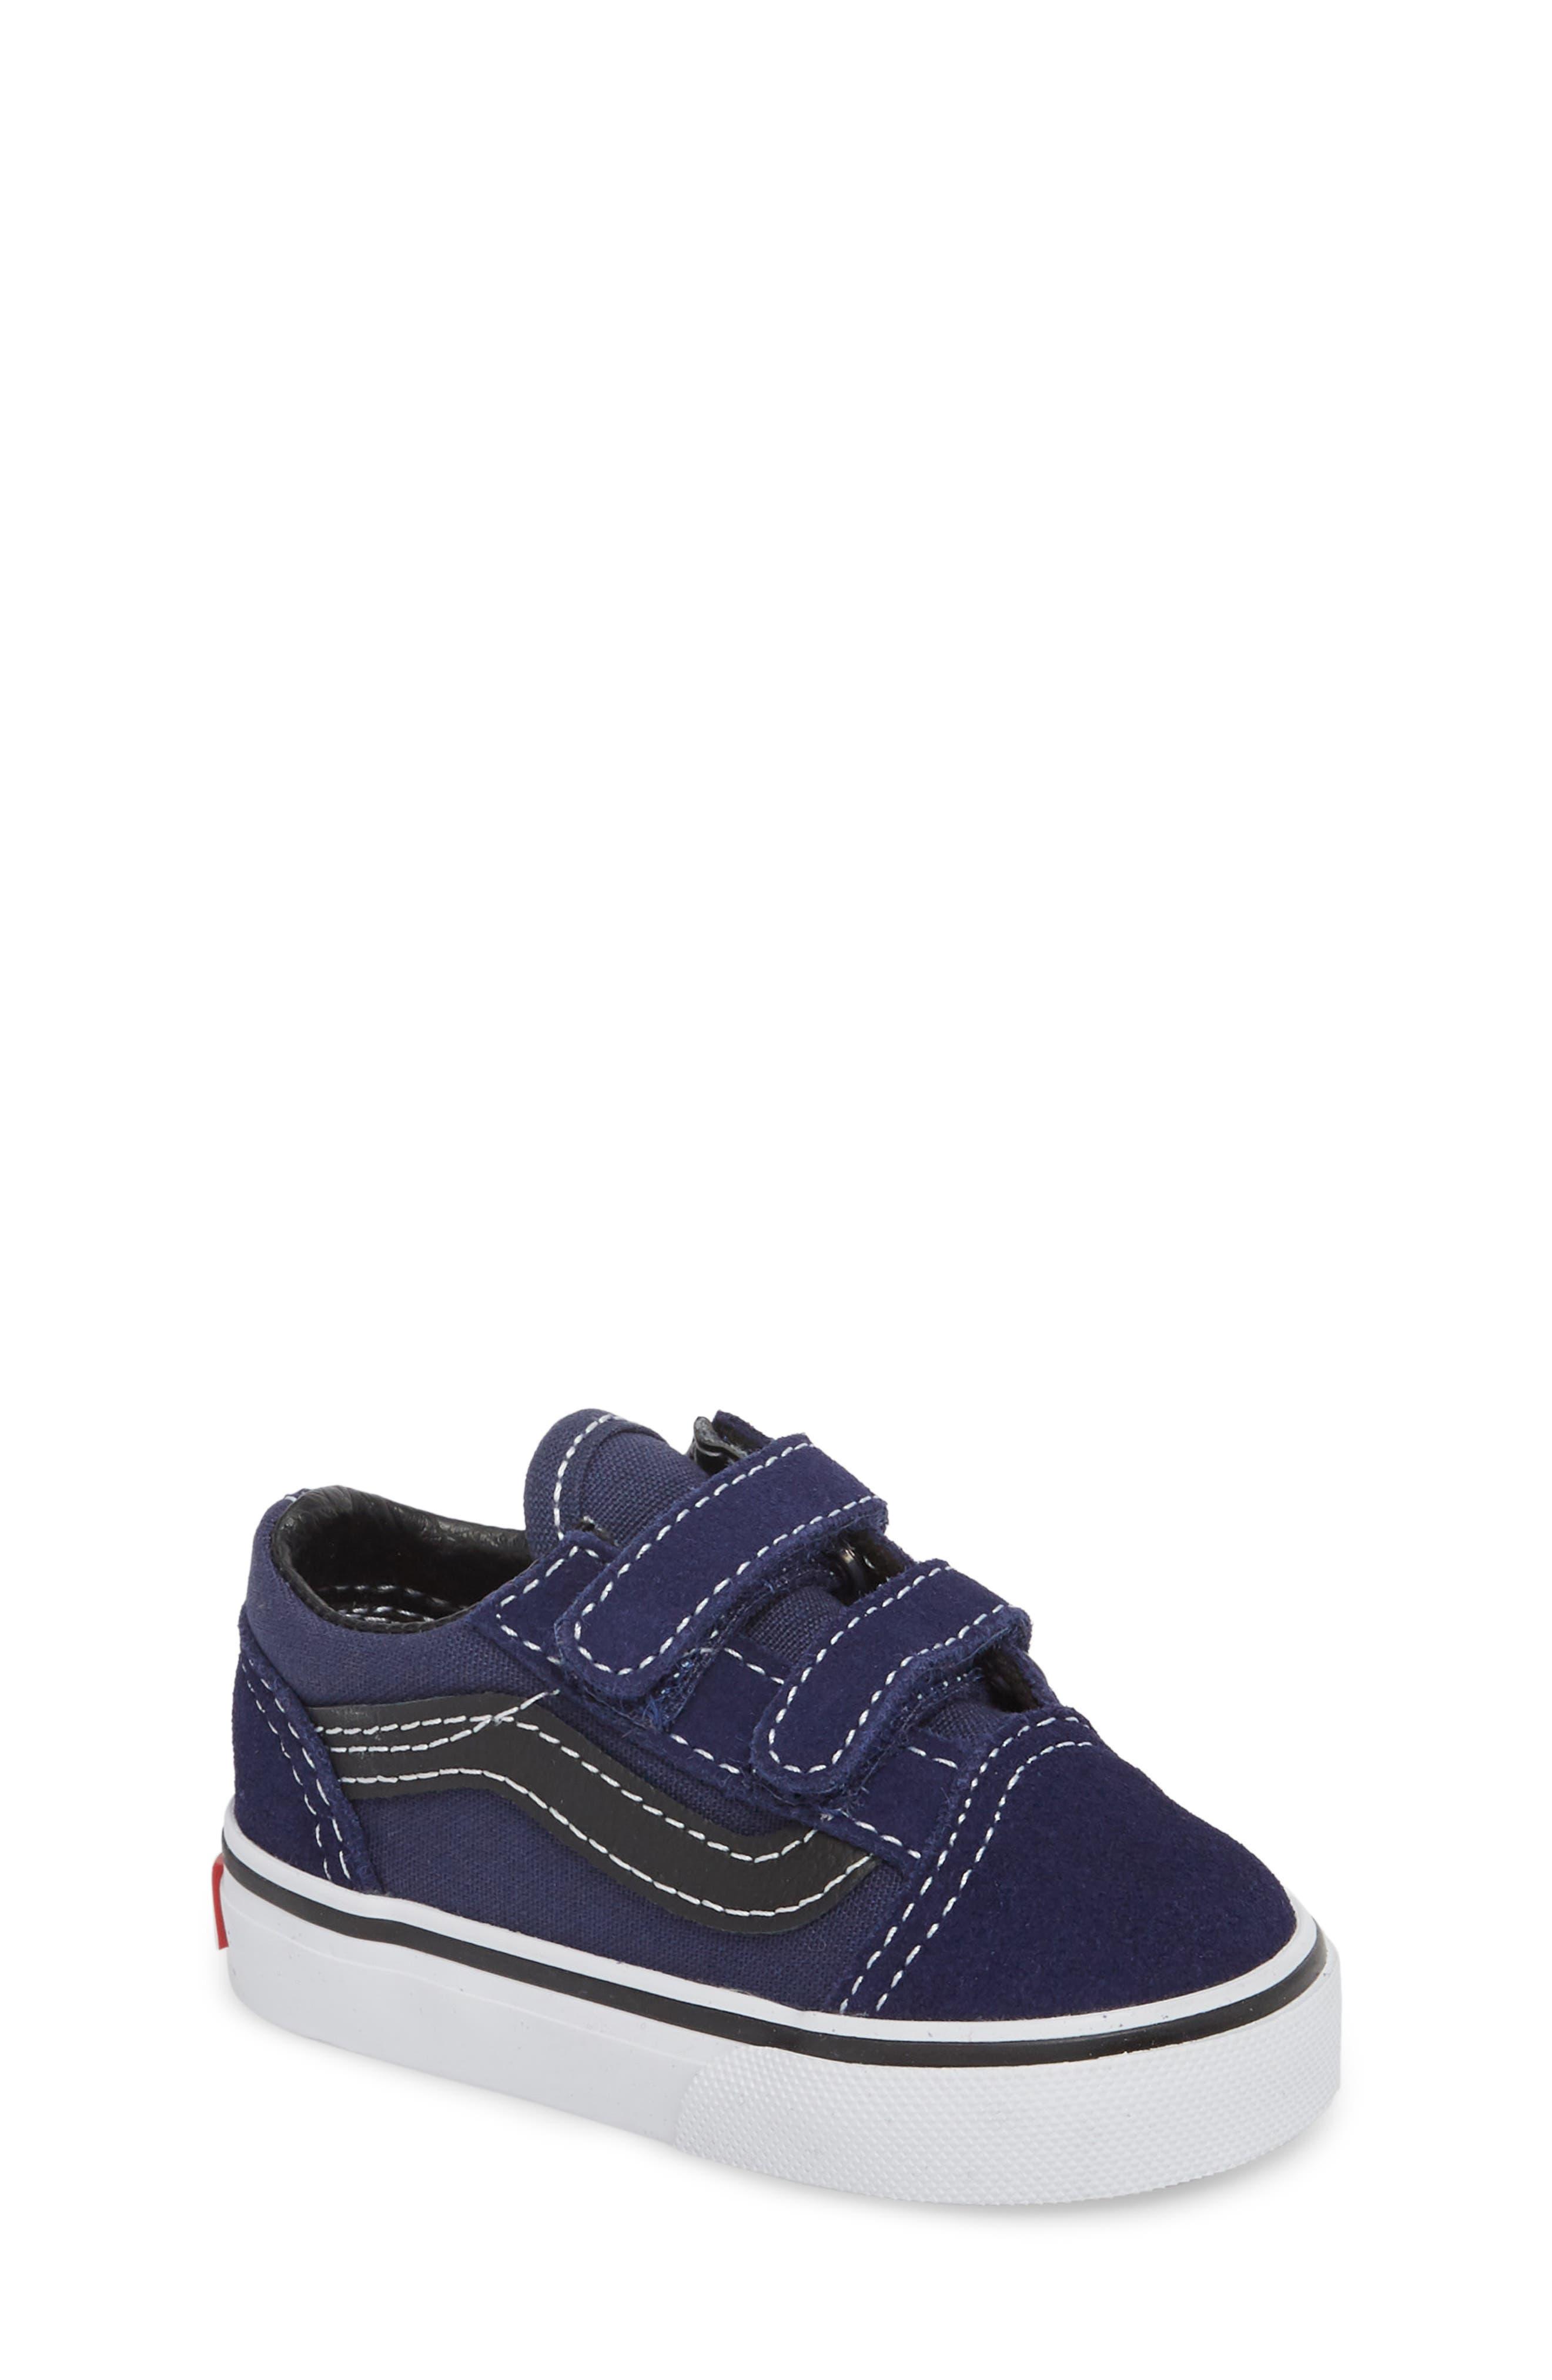 Old Skool V Sneaker,                             Main thumbnail 1, color,                             Medieval Blue/ Black